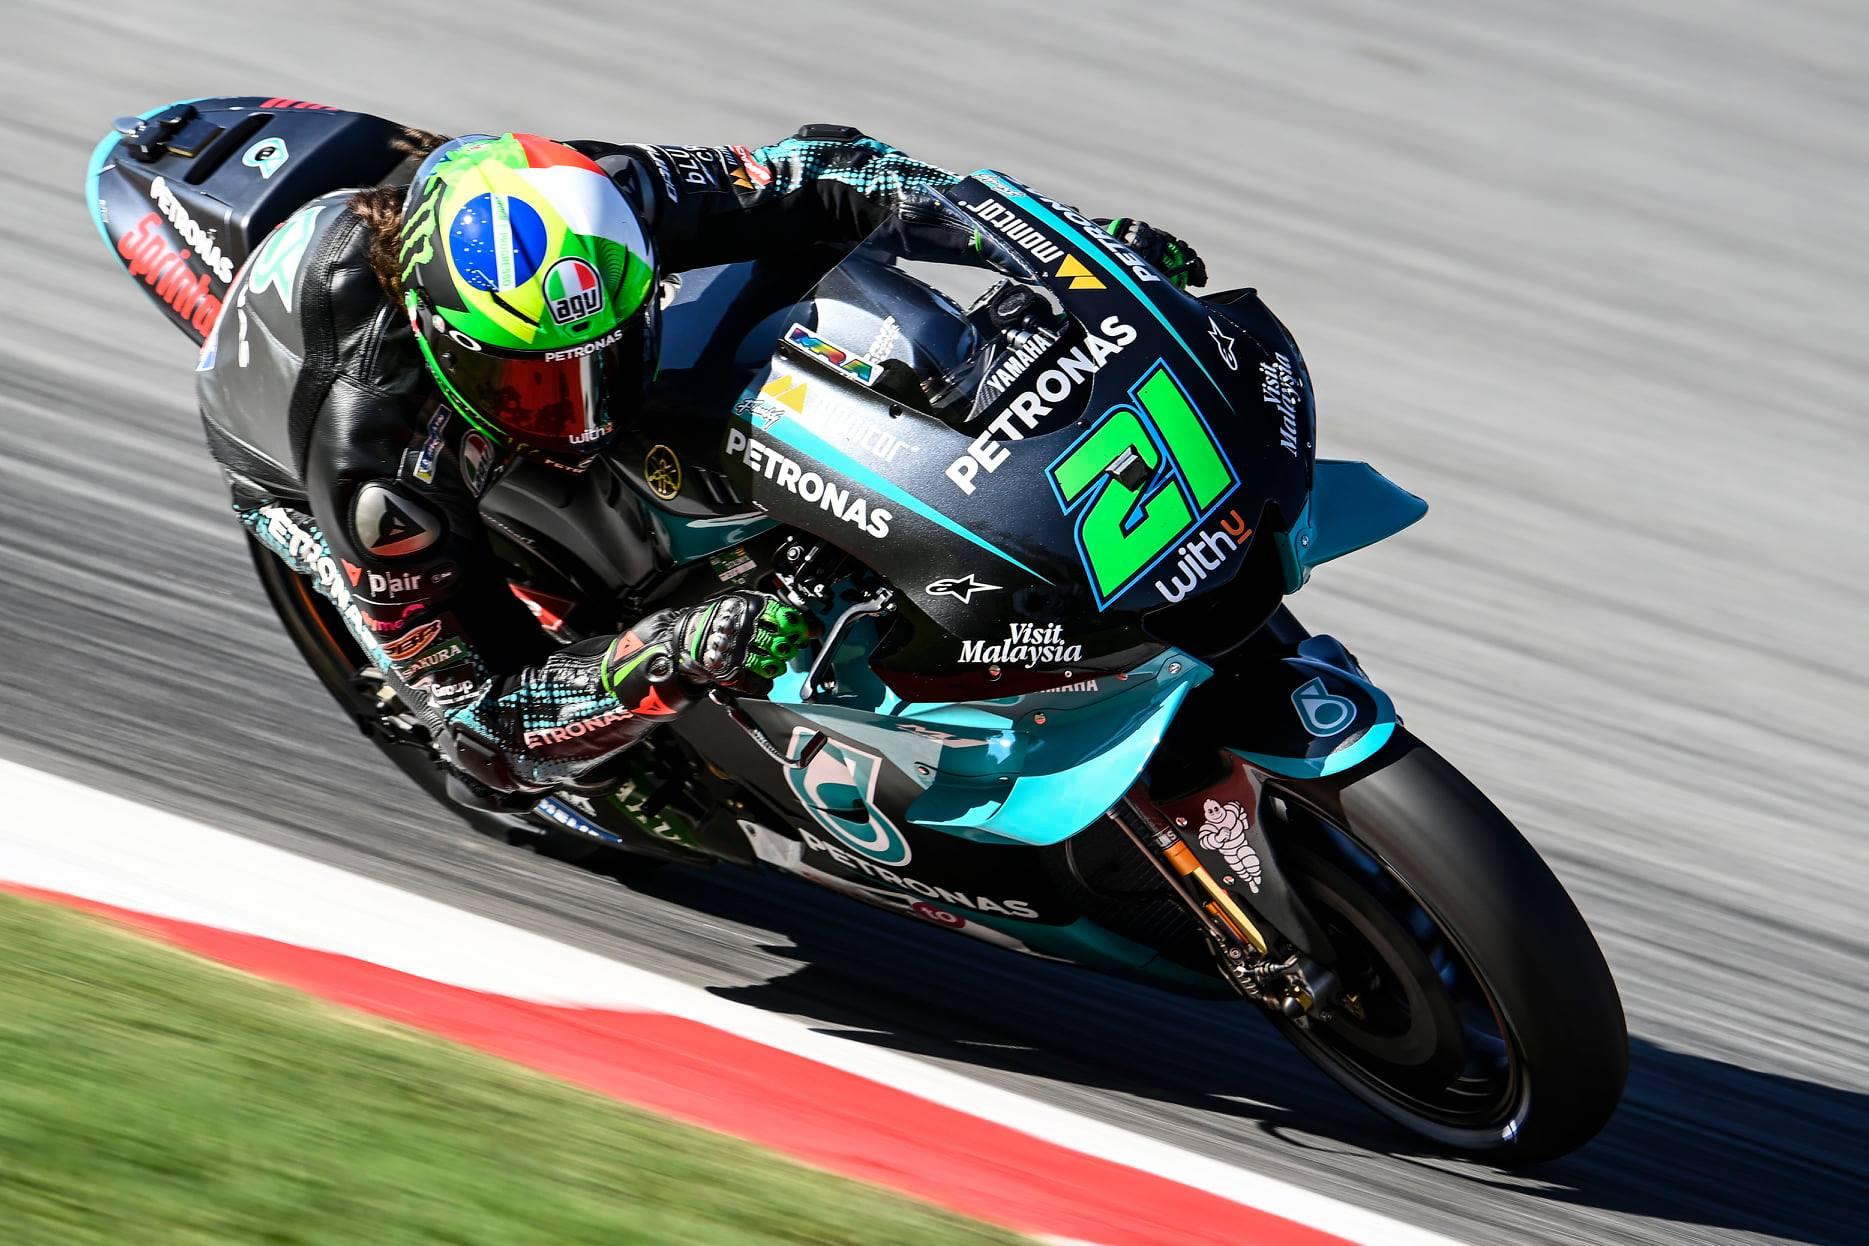 "MotoGP. Barselonoje pirmąją ""pole"" iškovojo F. Morbidelli"